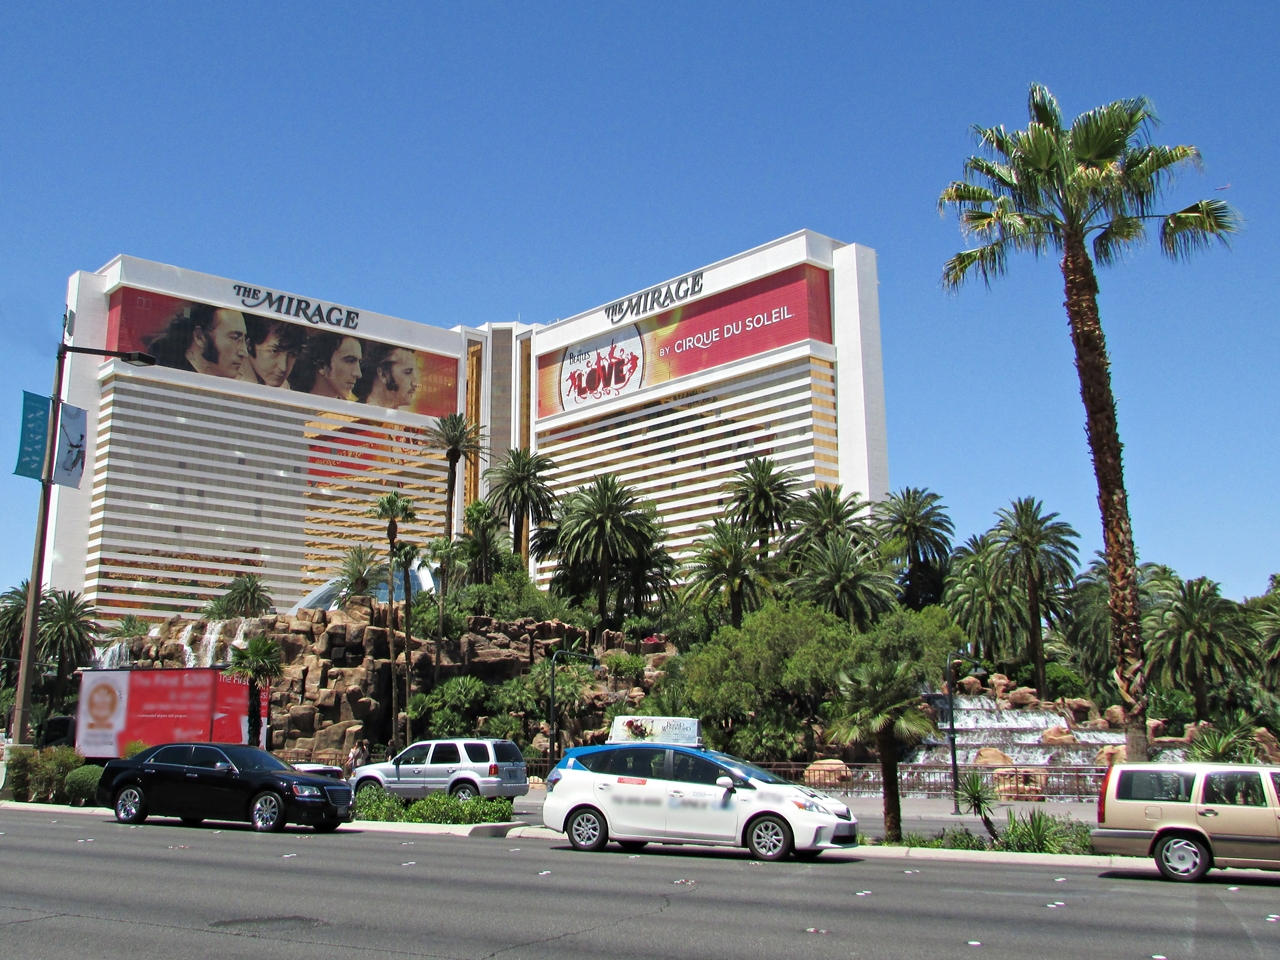 USA Rundreise - Amerika Westküste - Las Vegas Mirage - Fashionladyloves